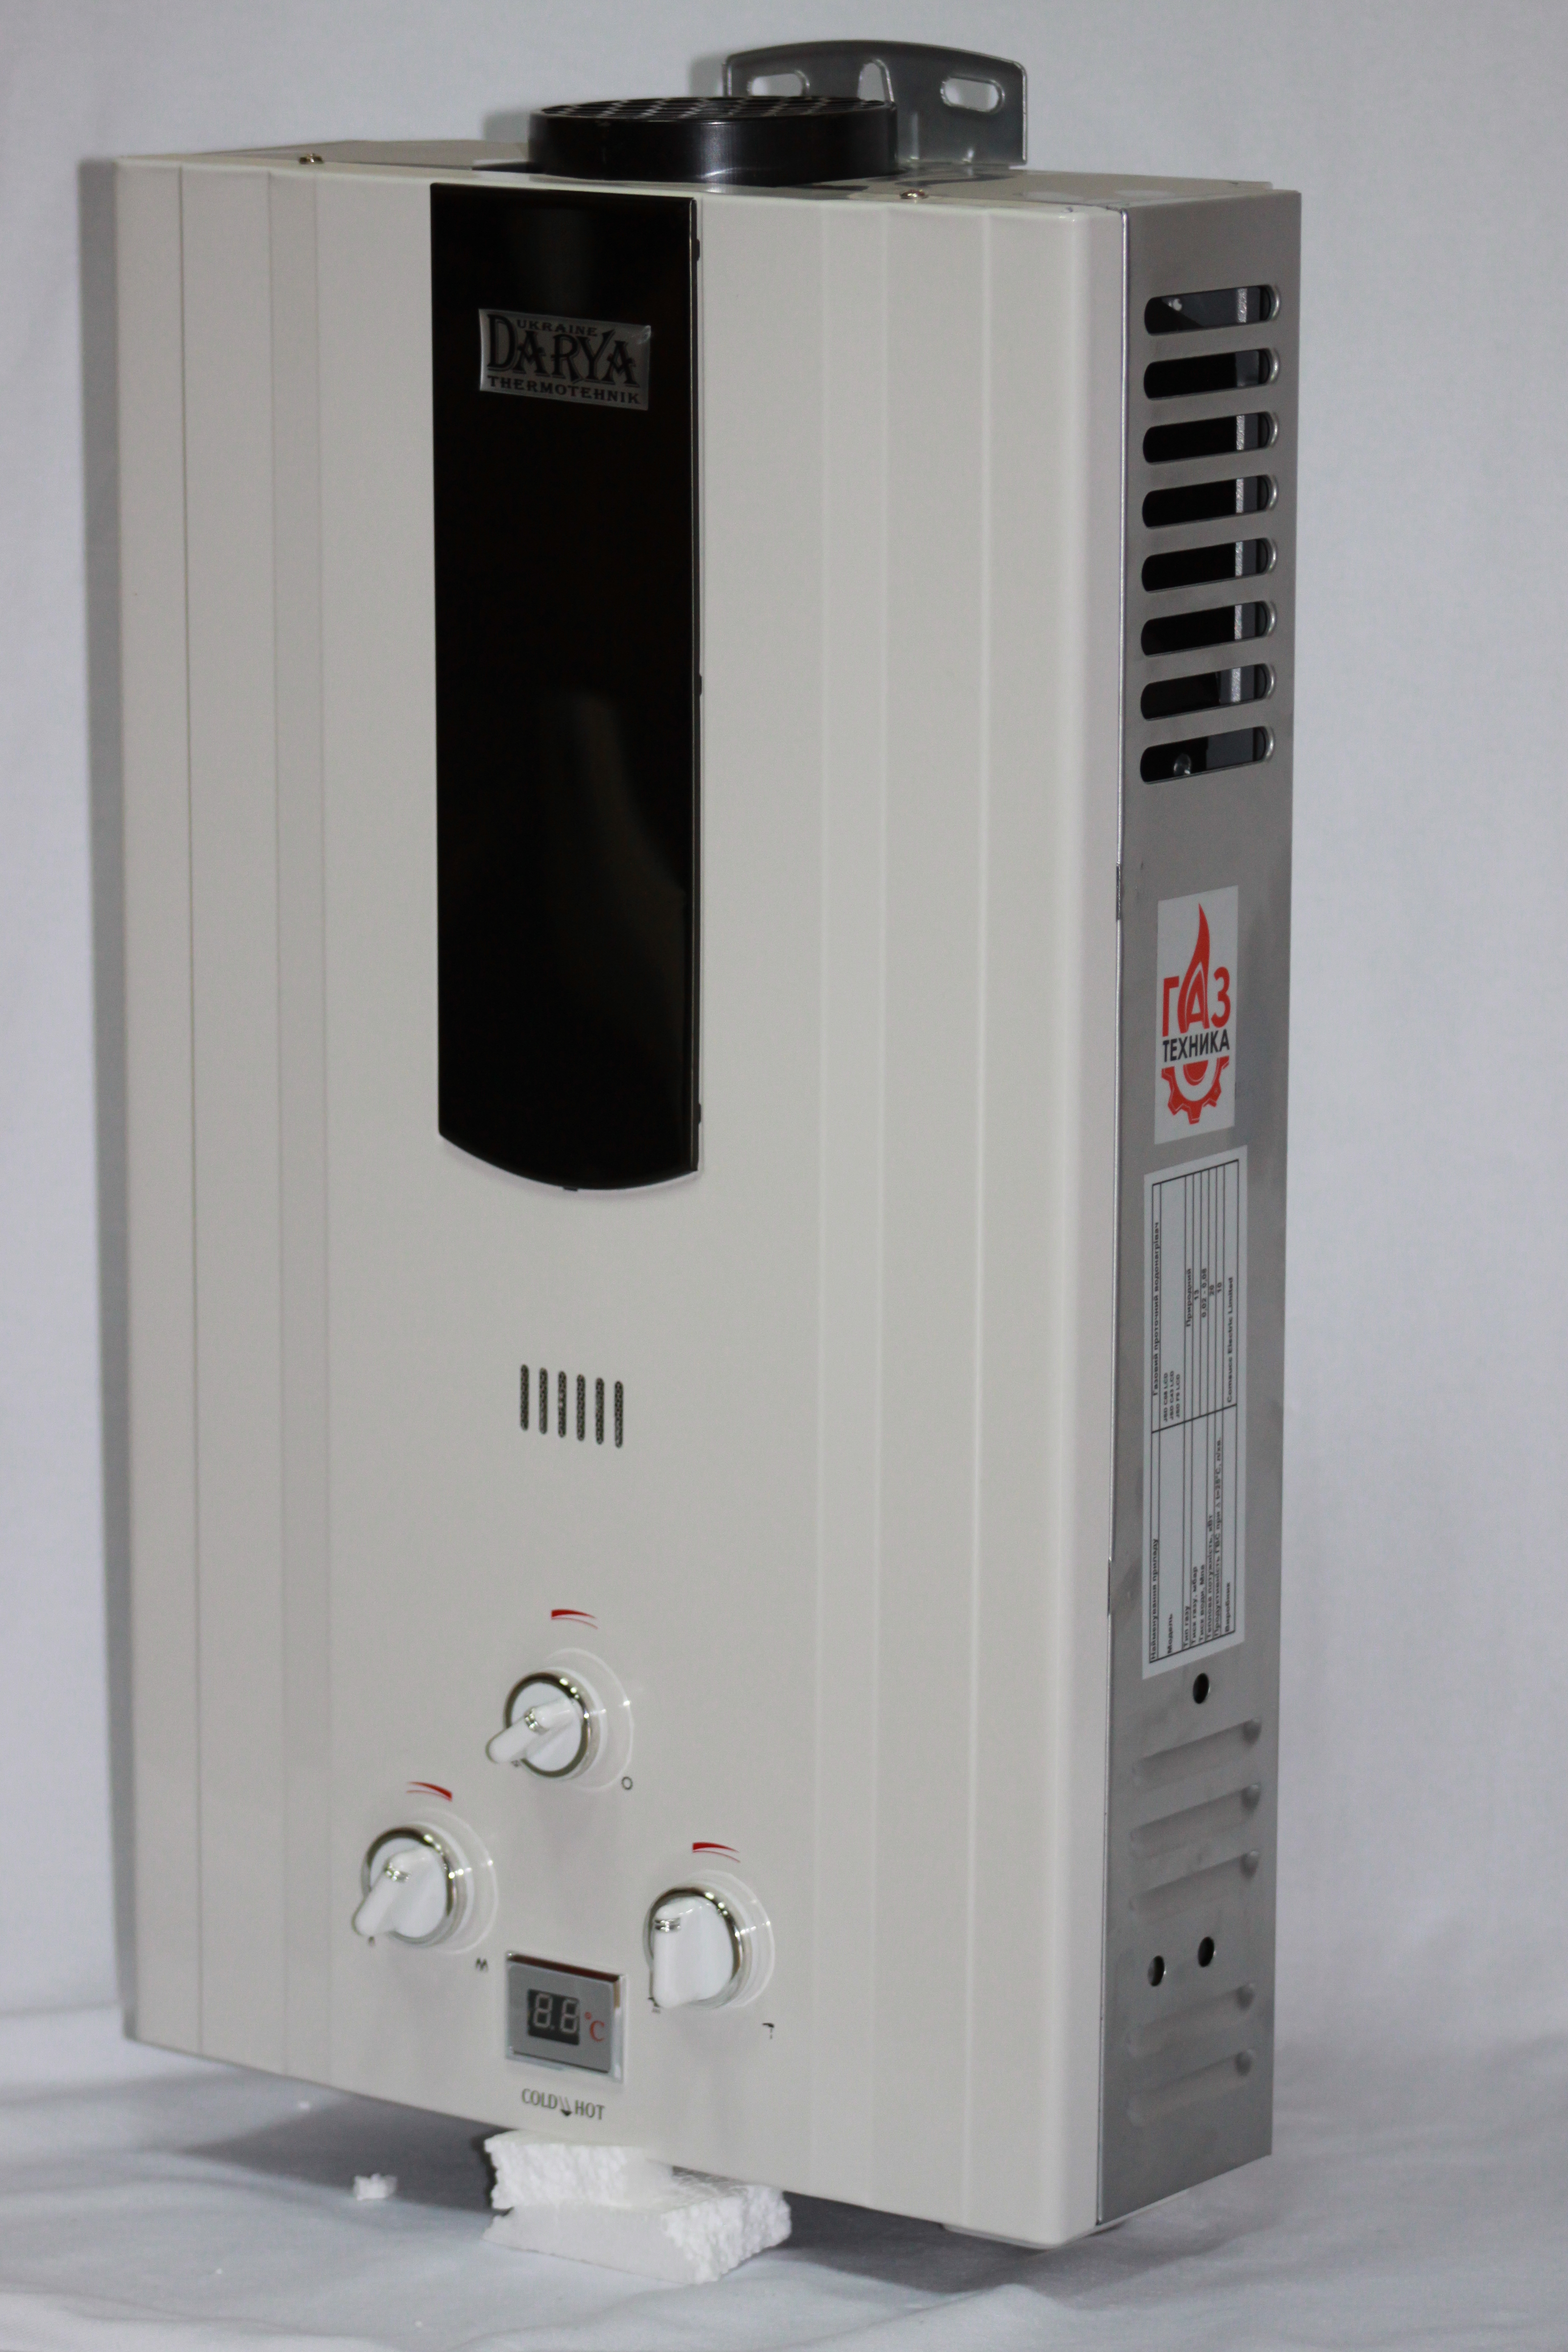 белая LCD Давление газа:13мбар. Теп мощность:20 кВт Давление воды:0,02-0,08Мпа Тип розж:от батереек Диаметр дымохода:110